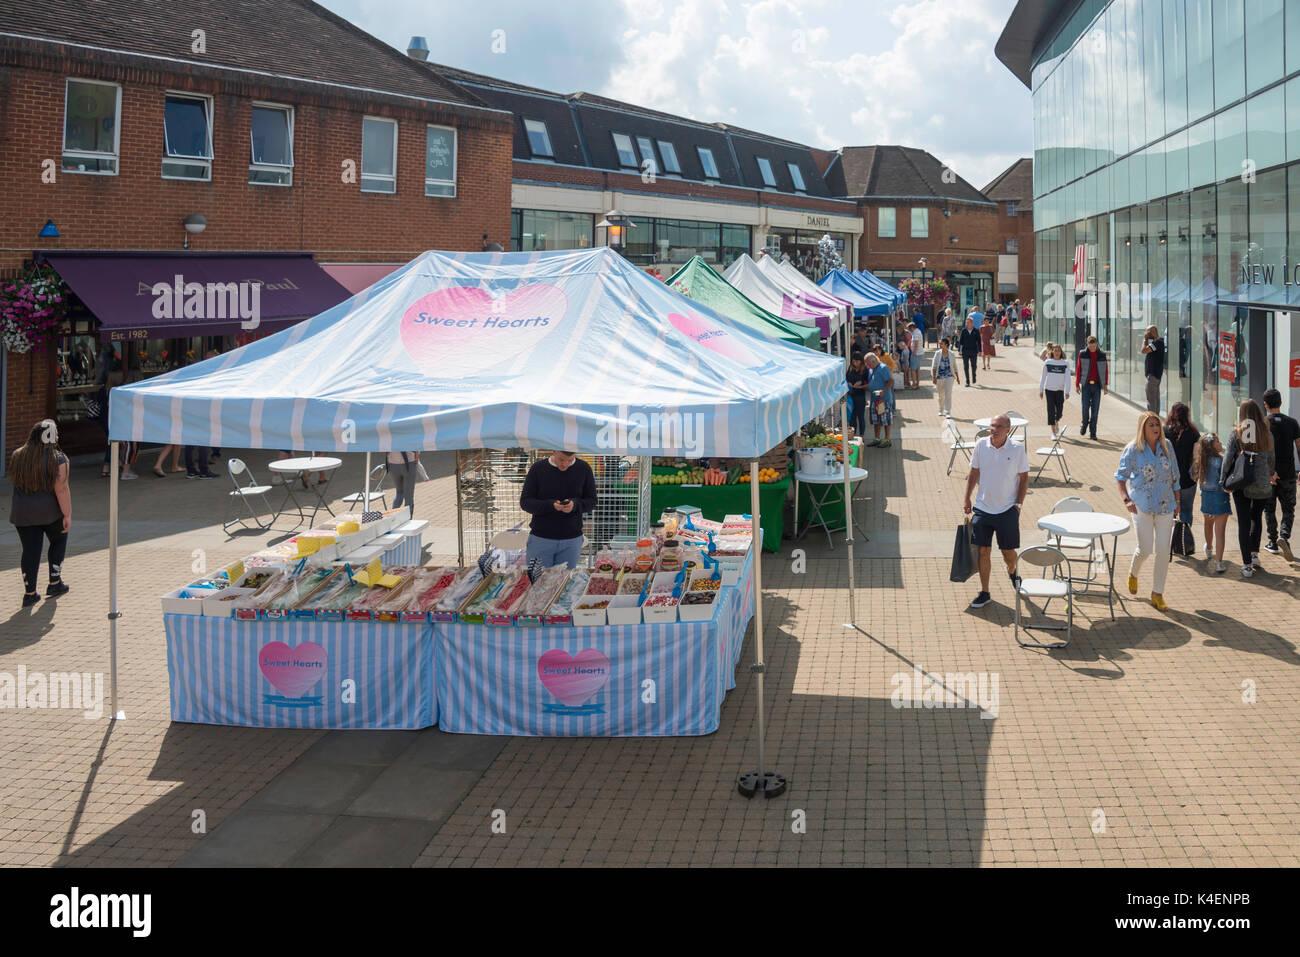 Food stalls, King Edward Court, Windsor, Berkshire, England, United Kingdom - Stock Image